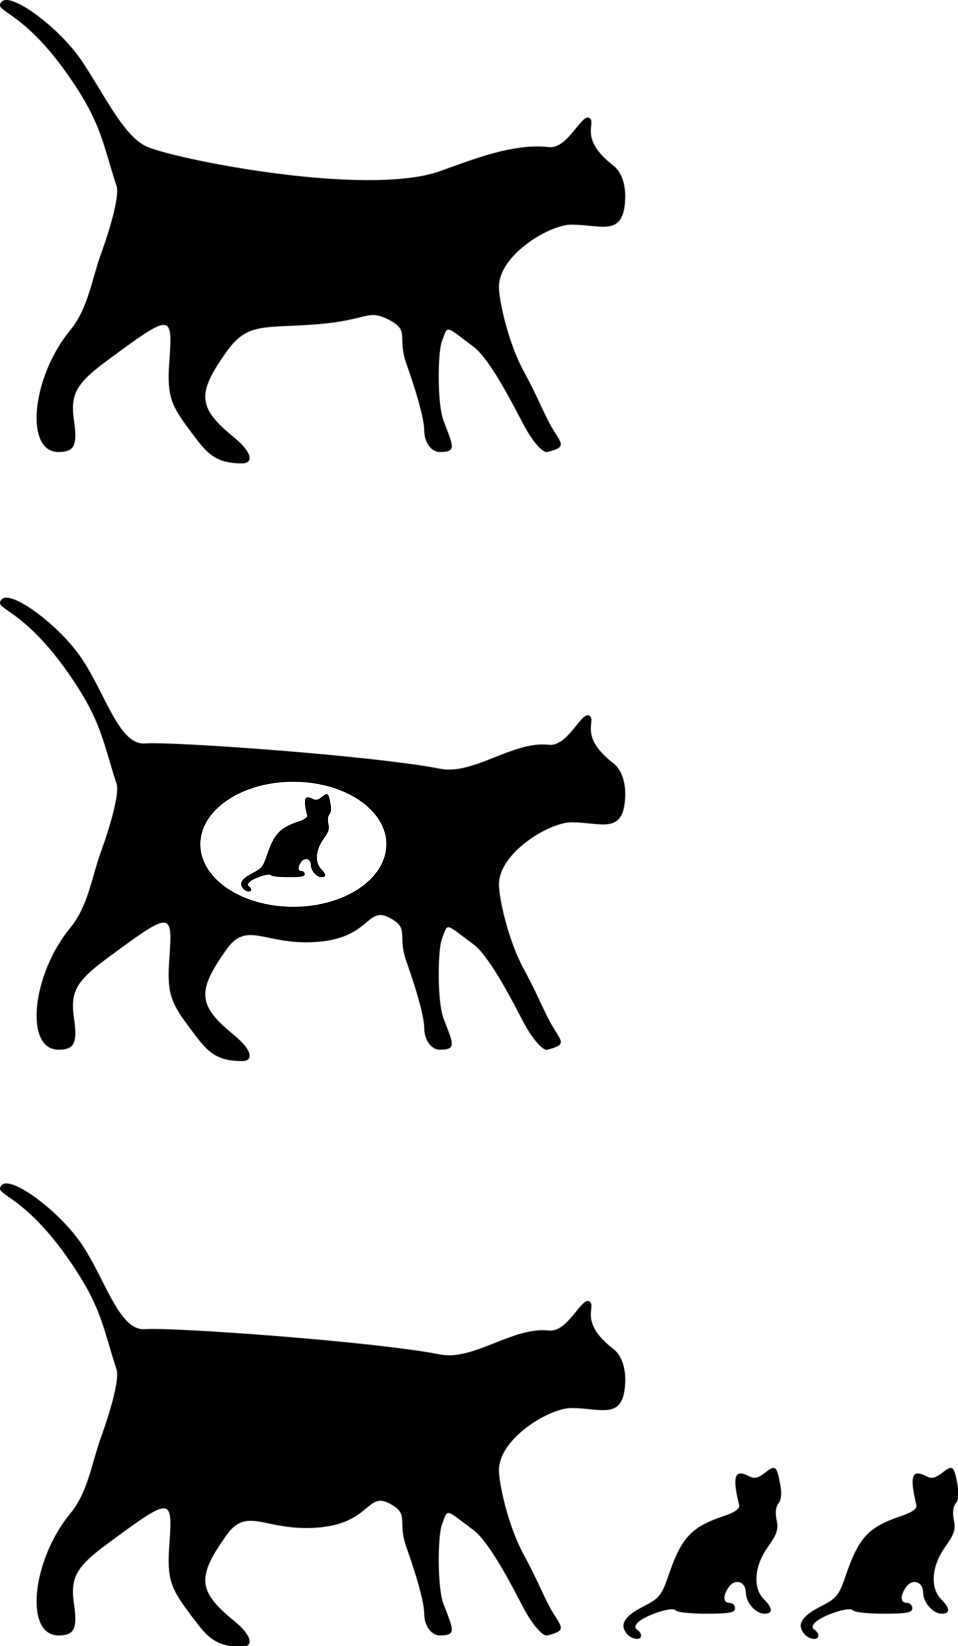 Illustration of cat icons : Free Stock Photo